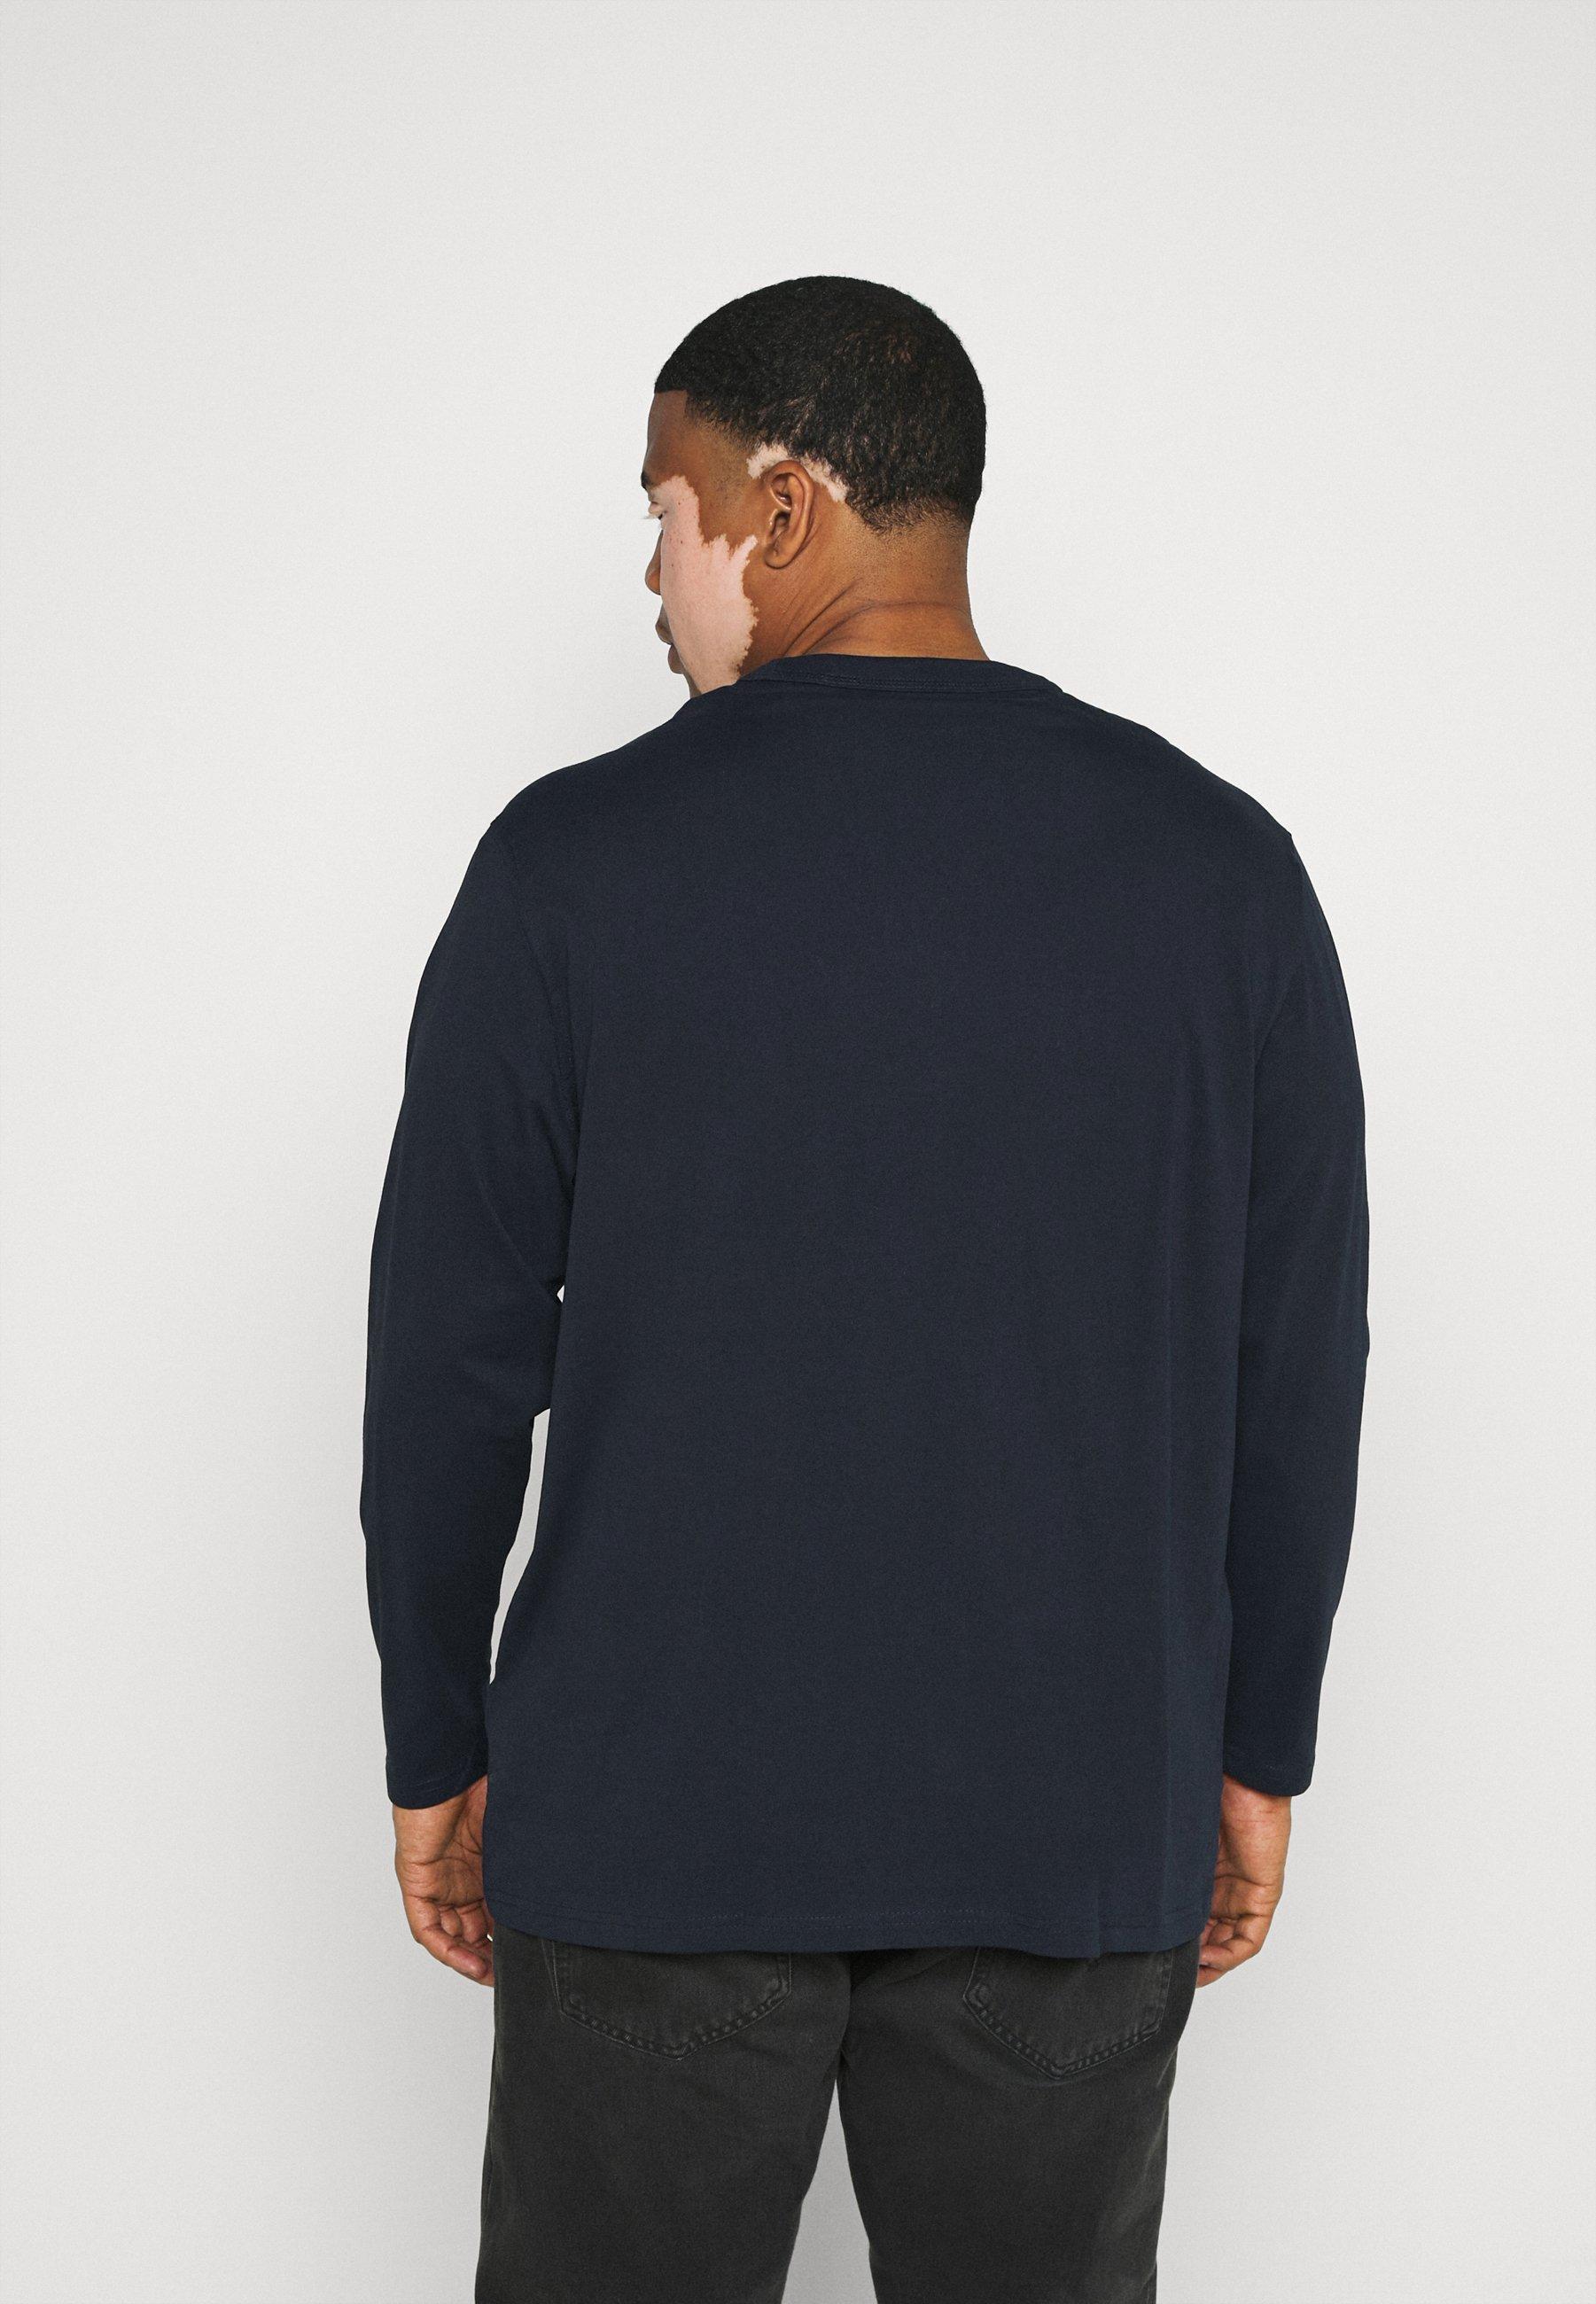 TOM TAILOR MEN PLUS Long sleeved top - dark blue X6Ls4